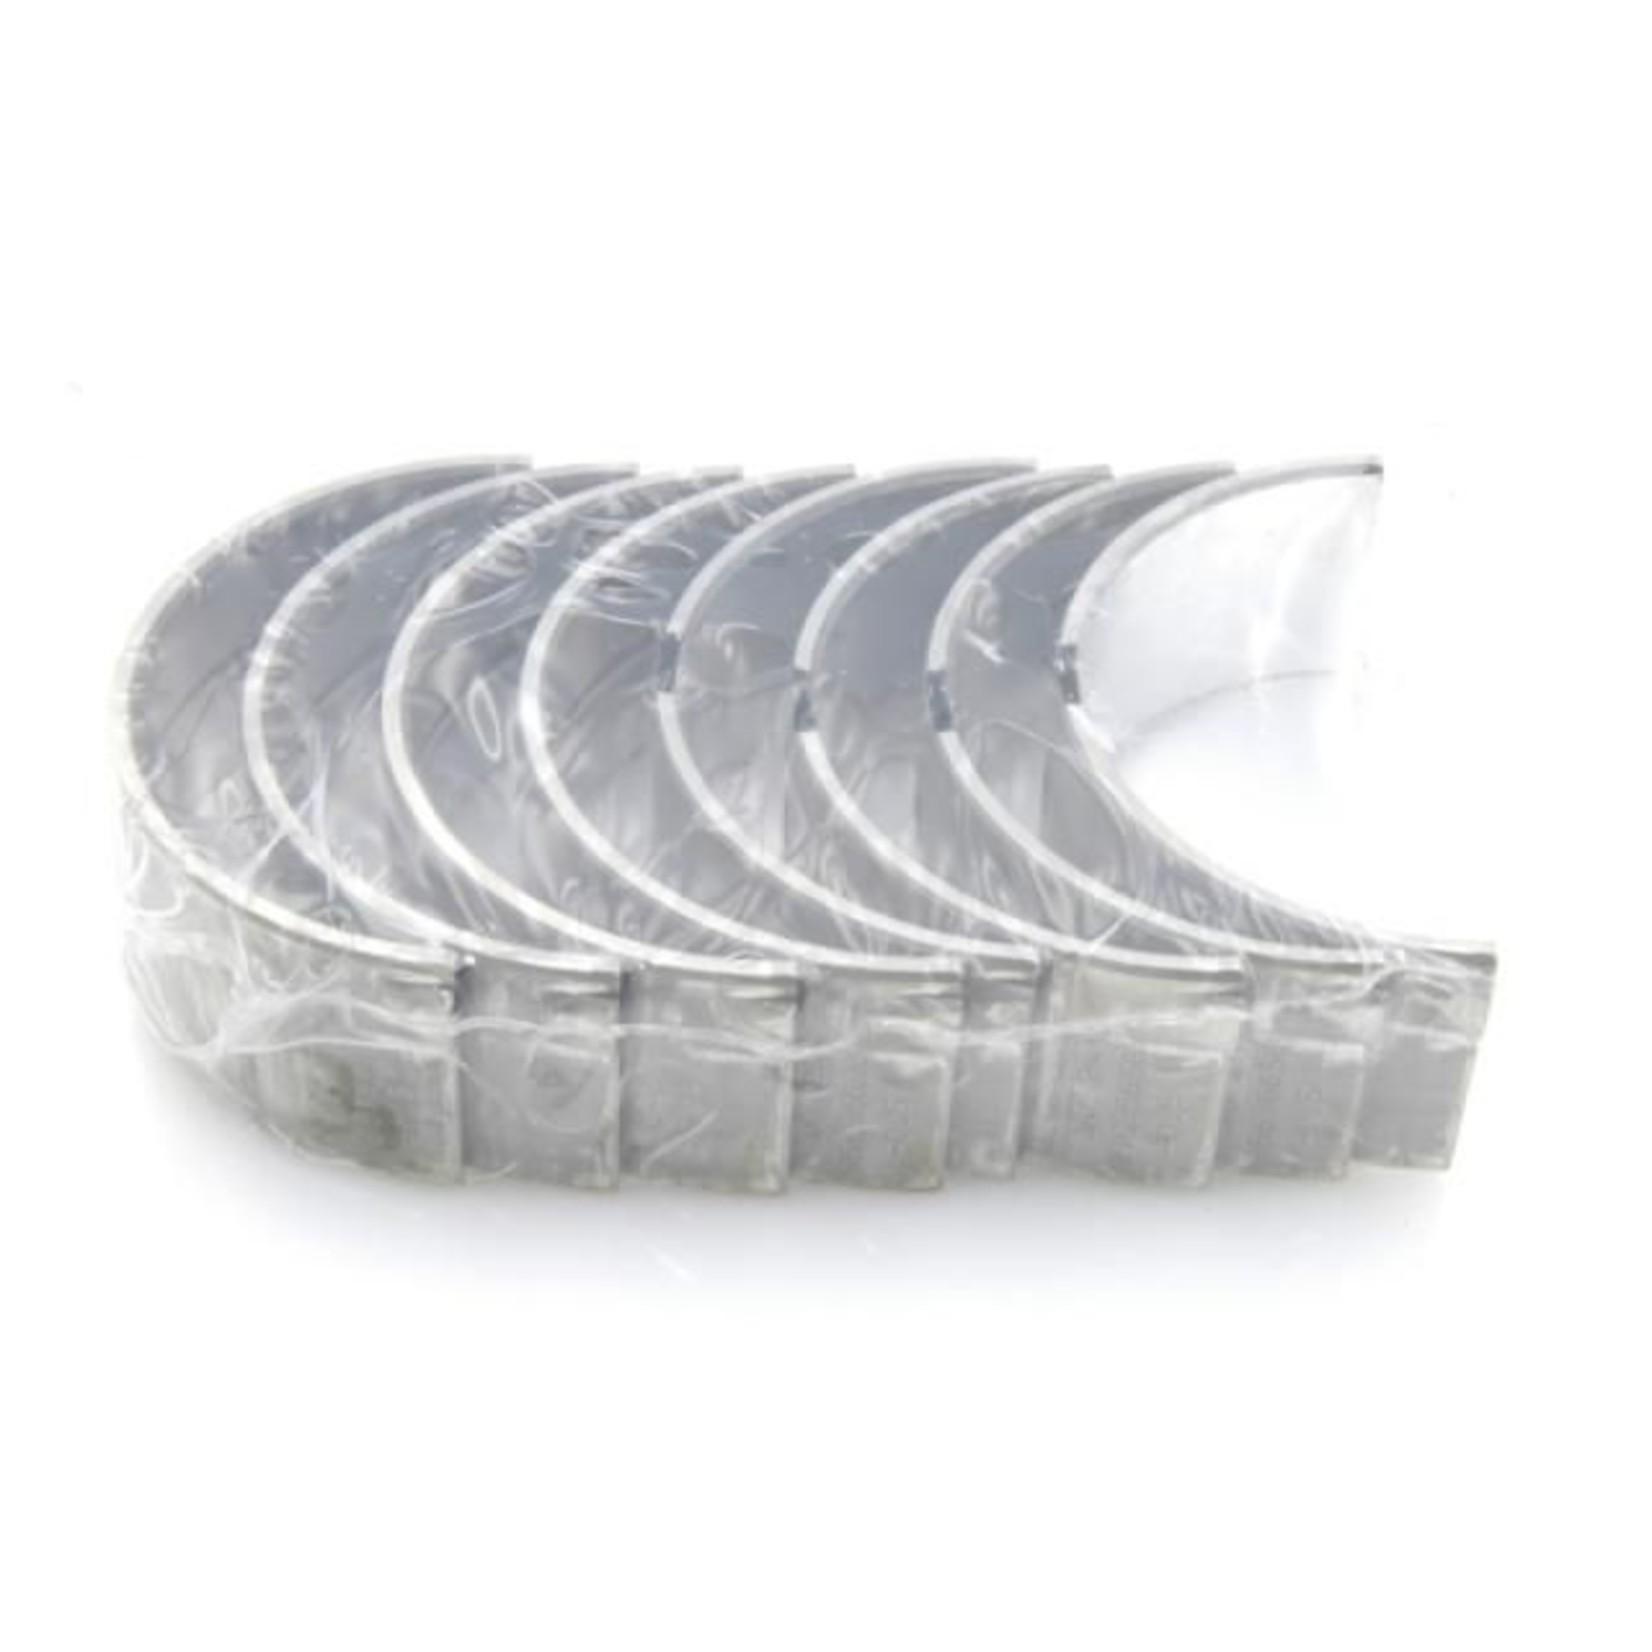 Casquillo cabeza biela 66- 0,25mm 5 paliers Nr Org: 5454753